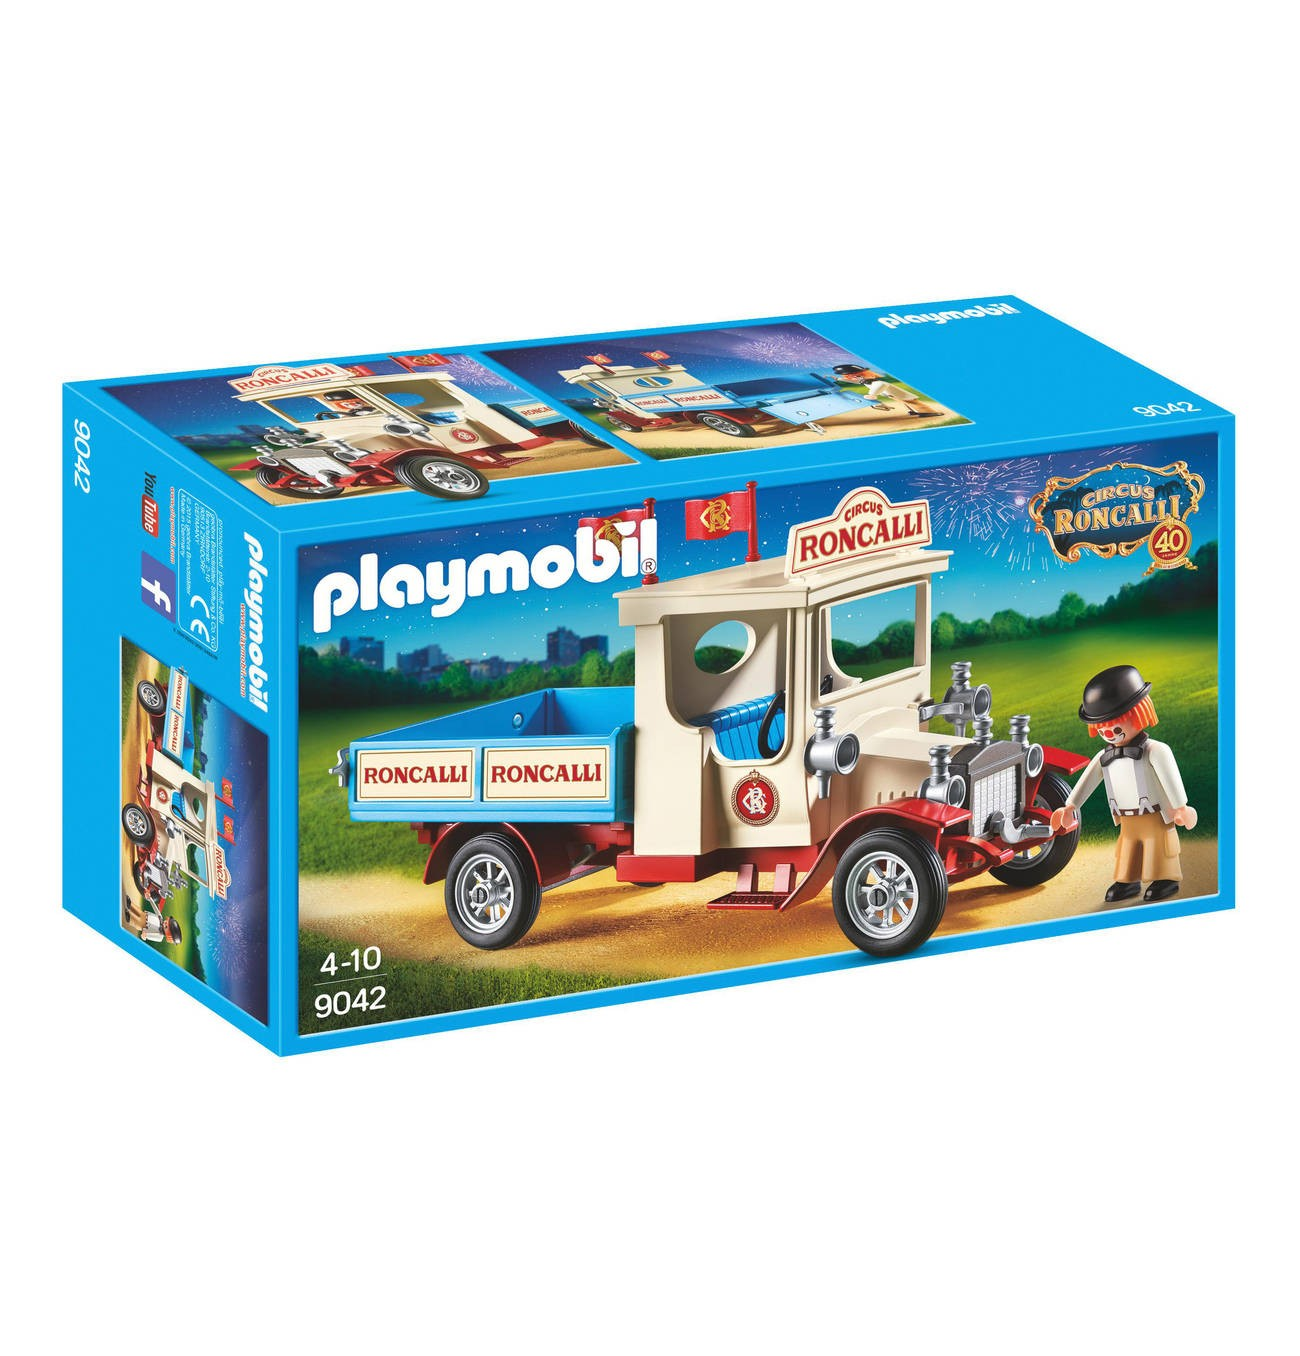 Playmobil Playmobil 9042 Staré cirkusové auto Playmobil